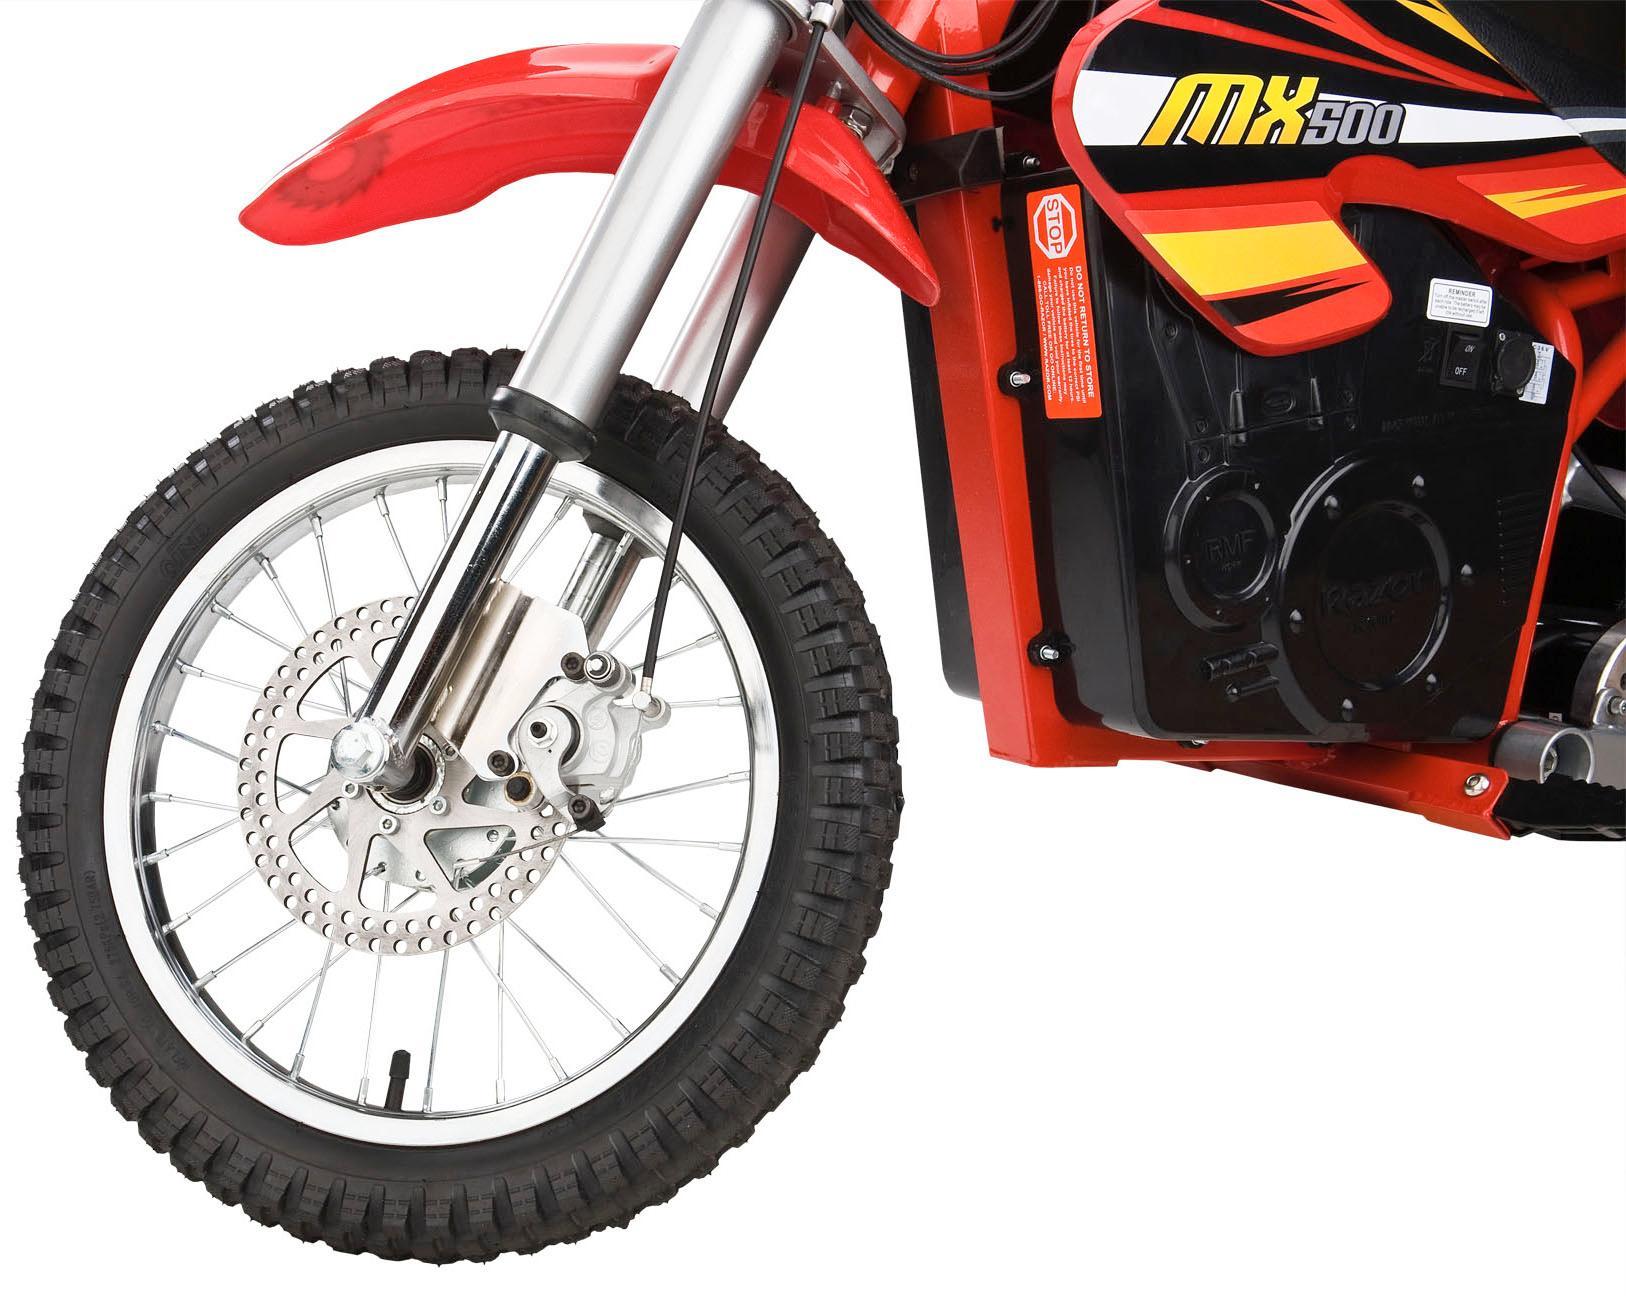 Amazon.com : Razor MX500 Dirt Rocket Electric Motocross Bike : Electric Motorcycle : Sports